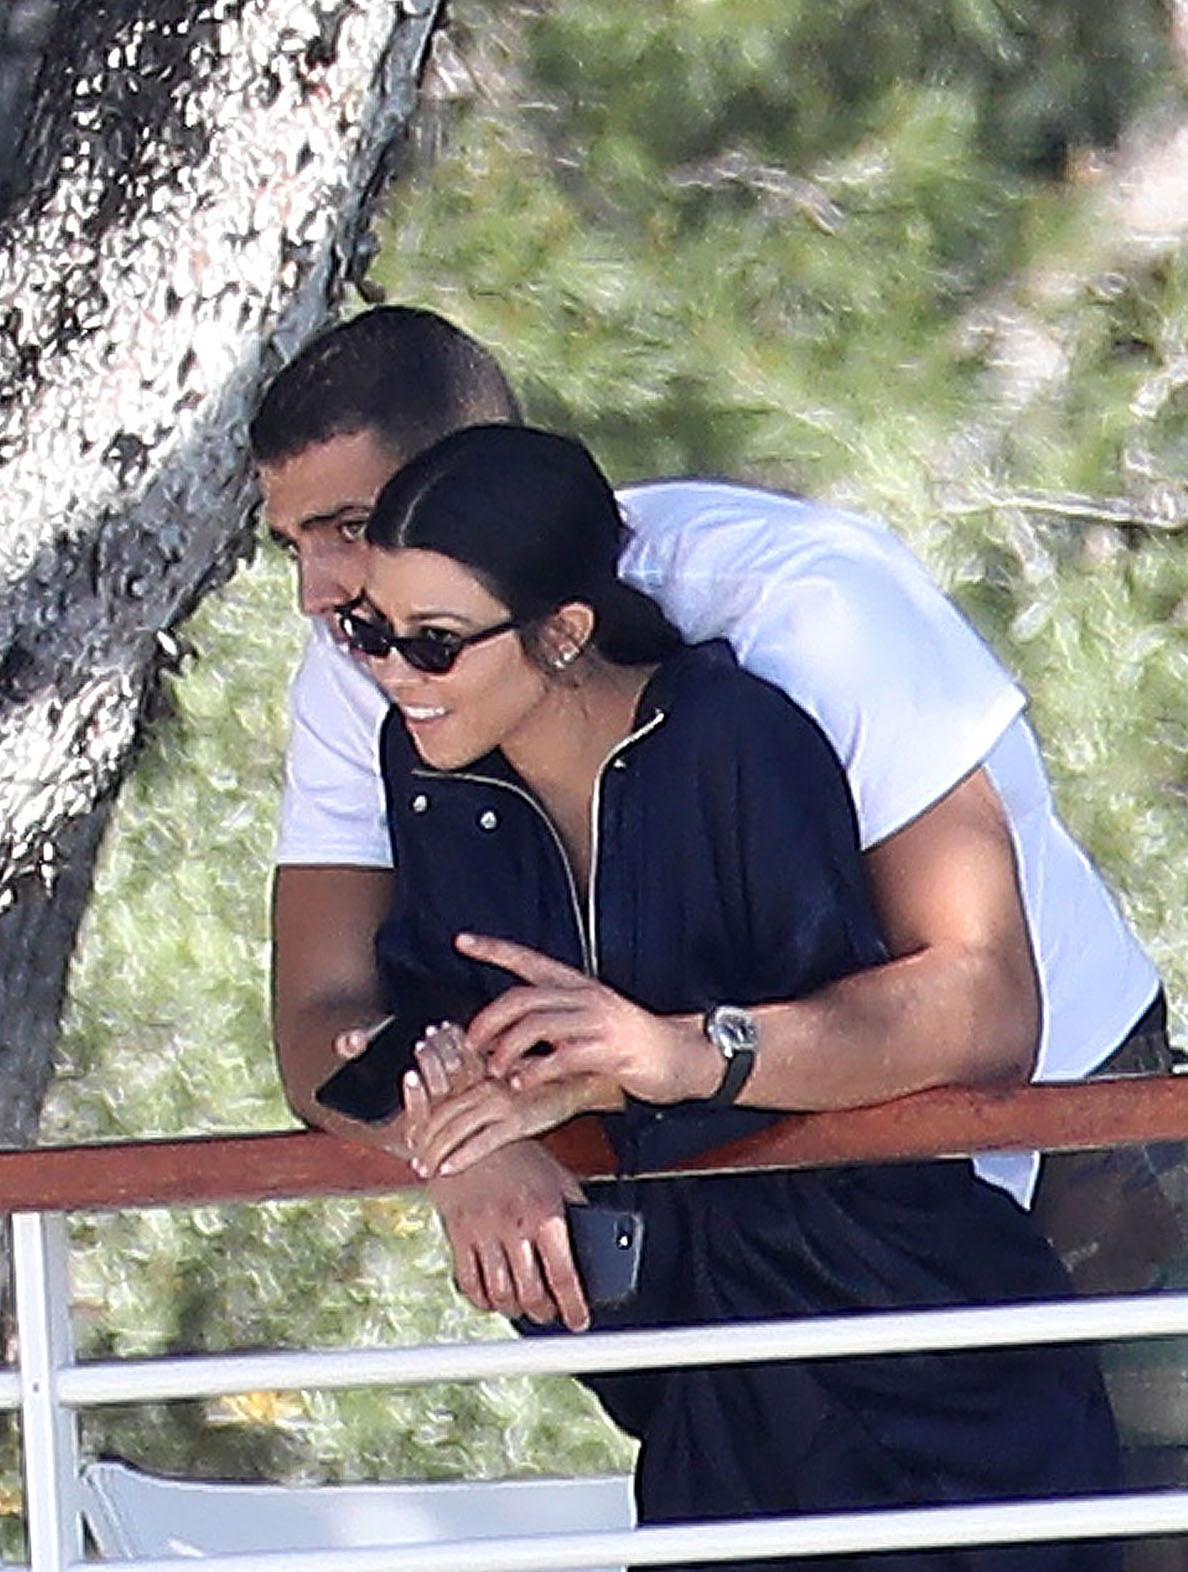 Kourtney Kardashian Cuddles With Younes Bendjima in France